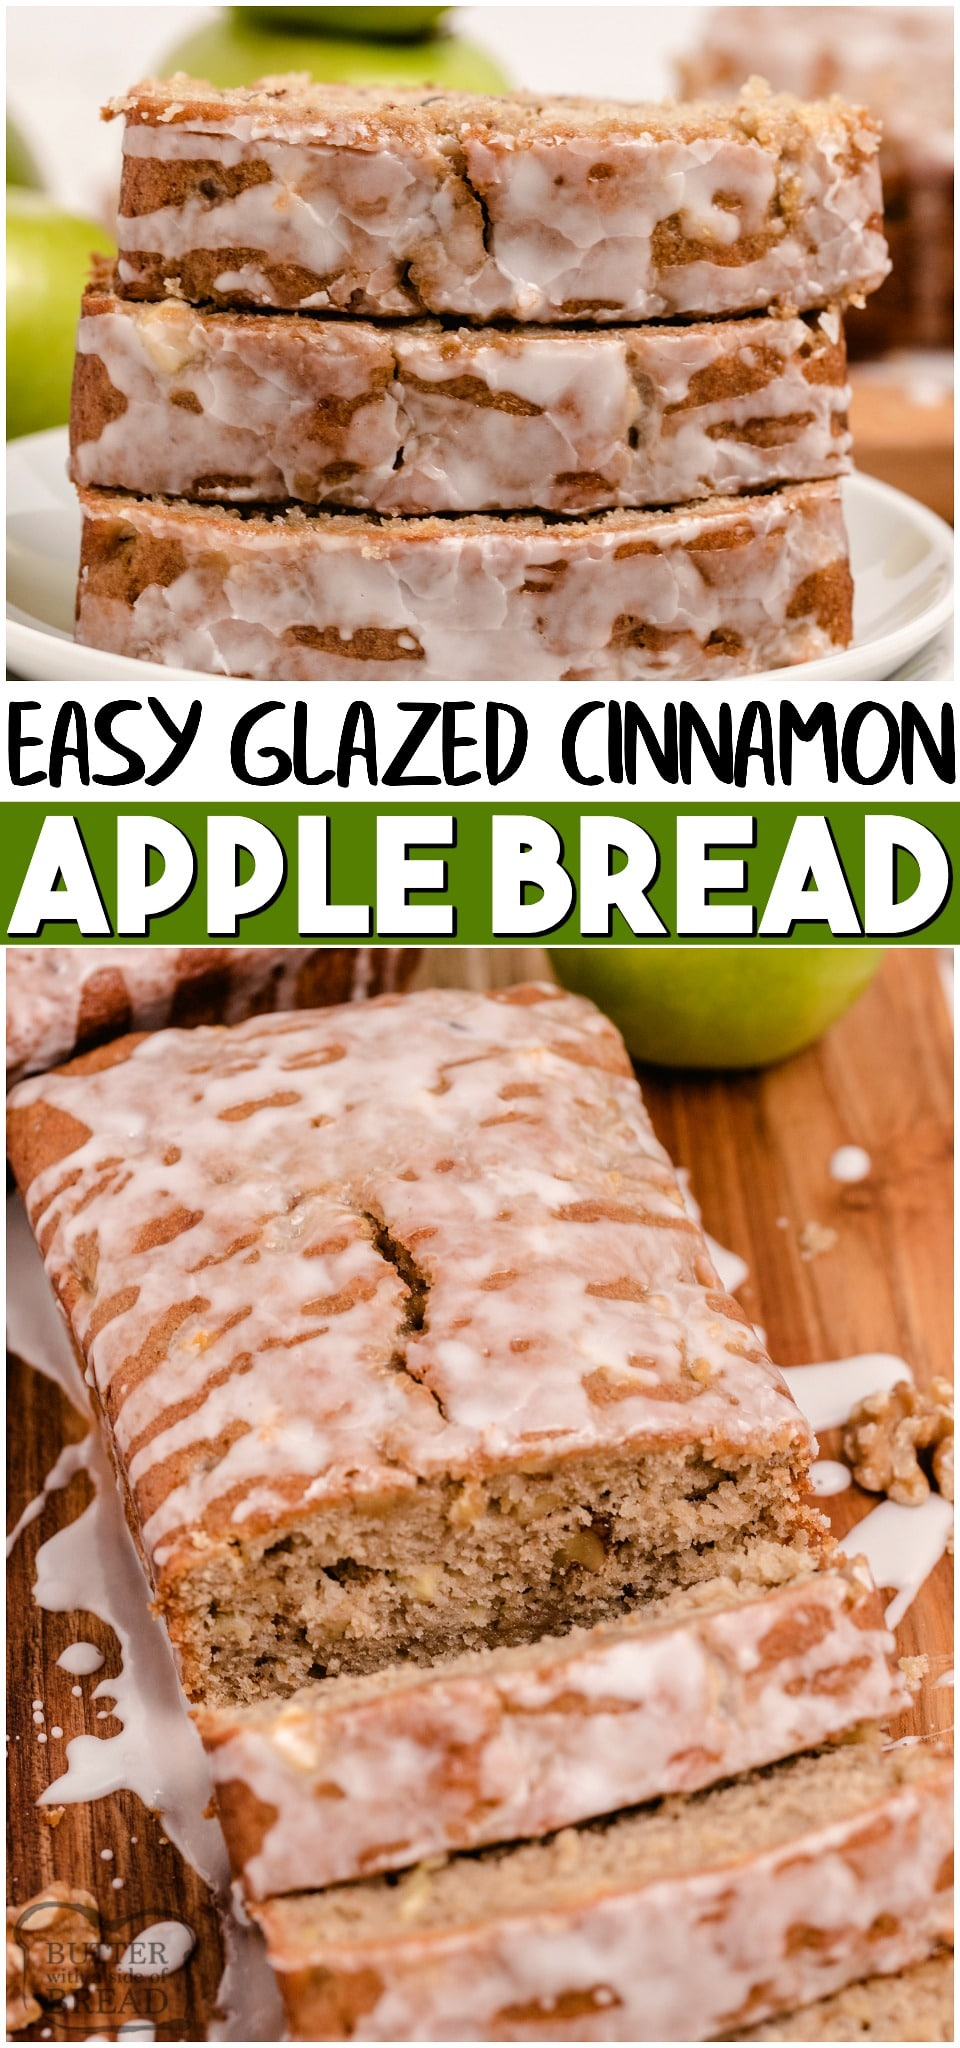 Apple walnut bread is a sweet apple bread recipe with walnuts! Perfect apple quick bread recipe with a light glaze that everyone loves! #bread #apples #cinnamon #quickbread #sweet #recipe from BUTTER WITH A SIDE OF BREAD